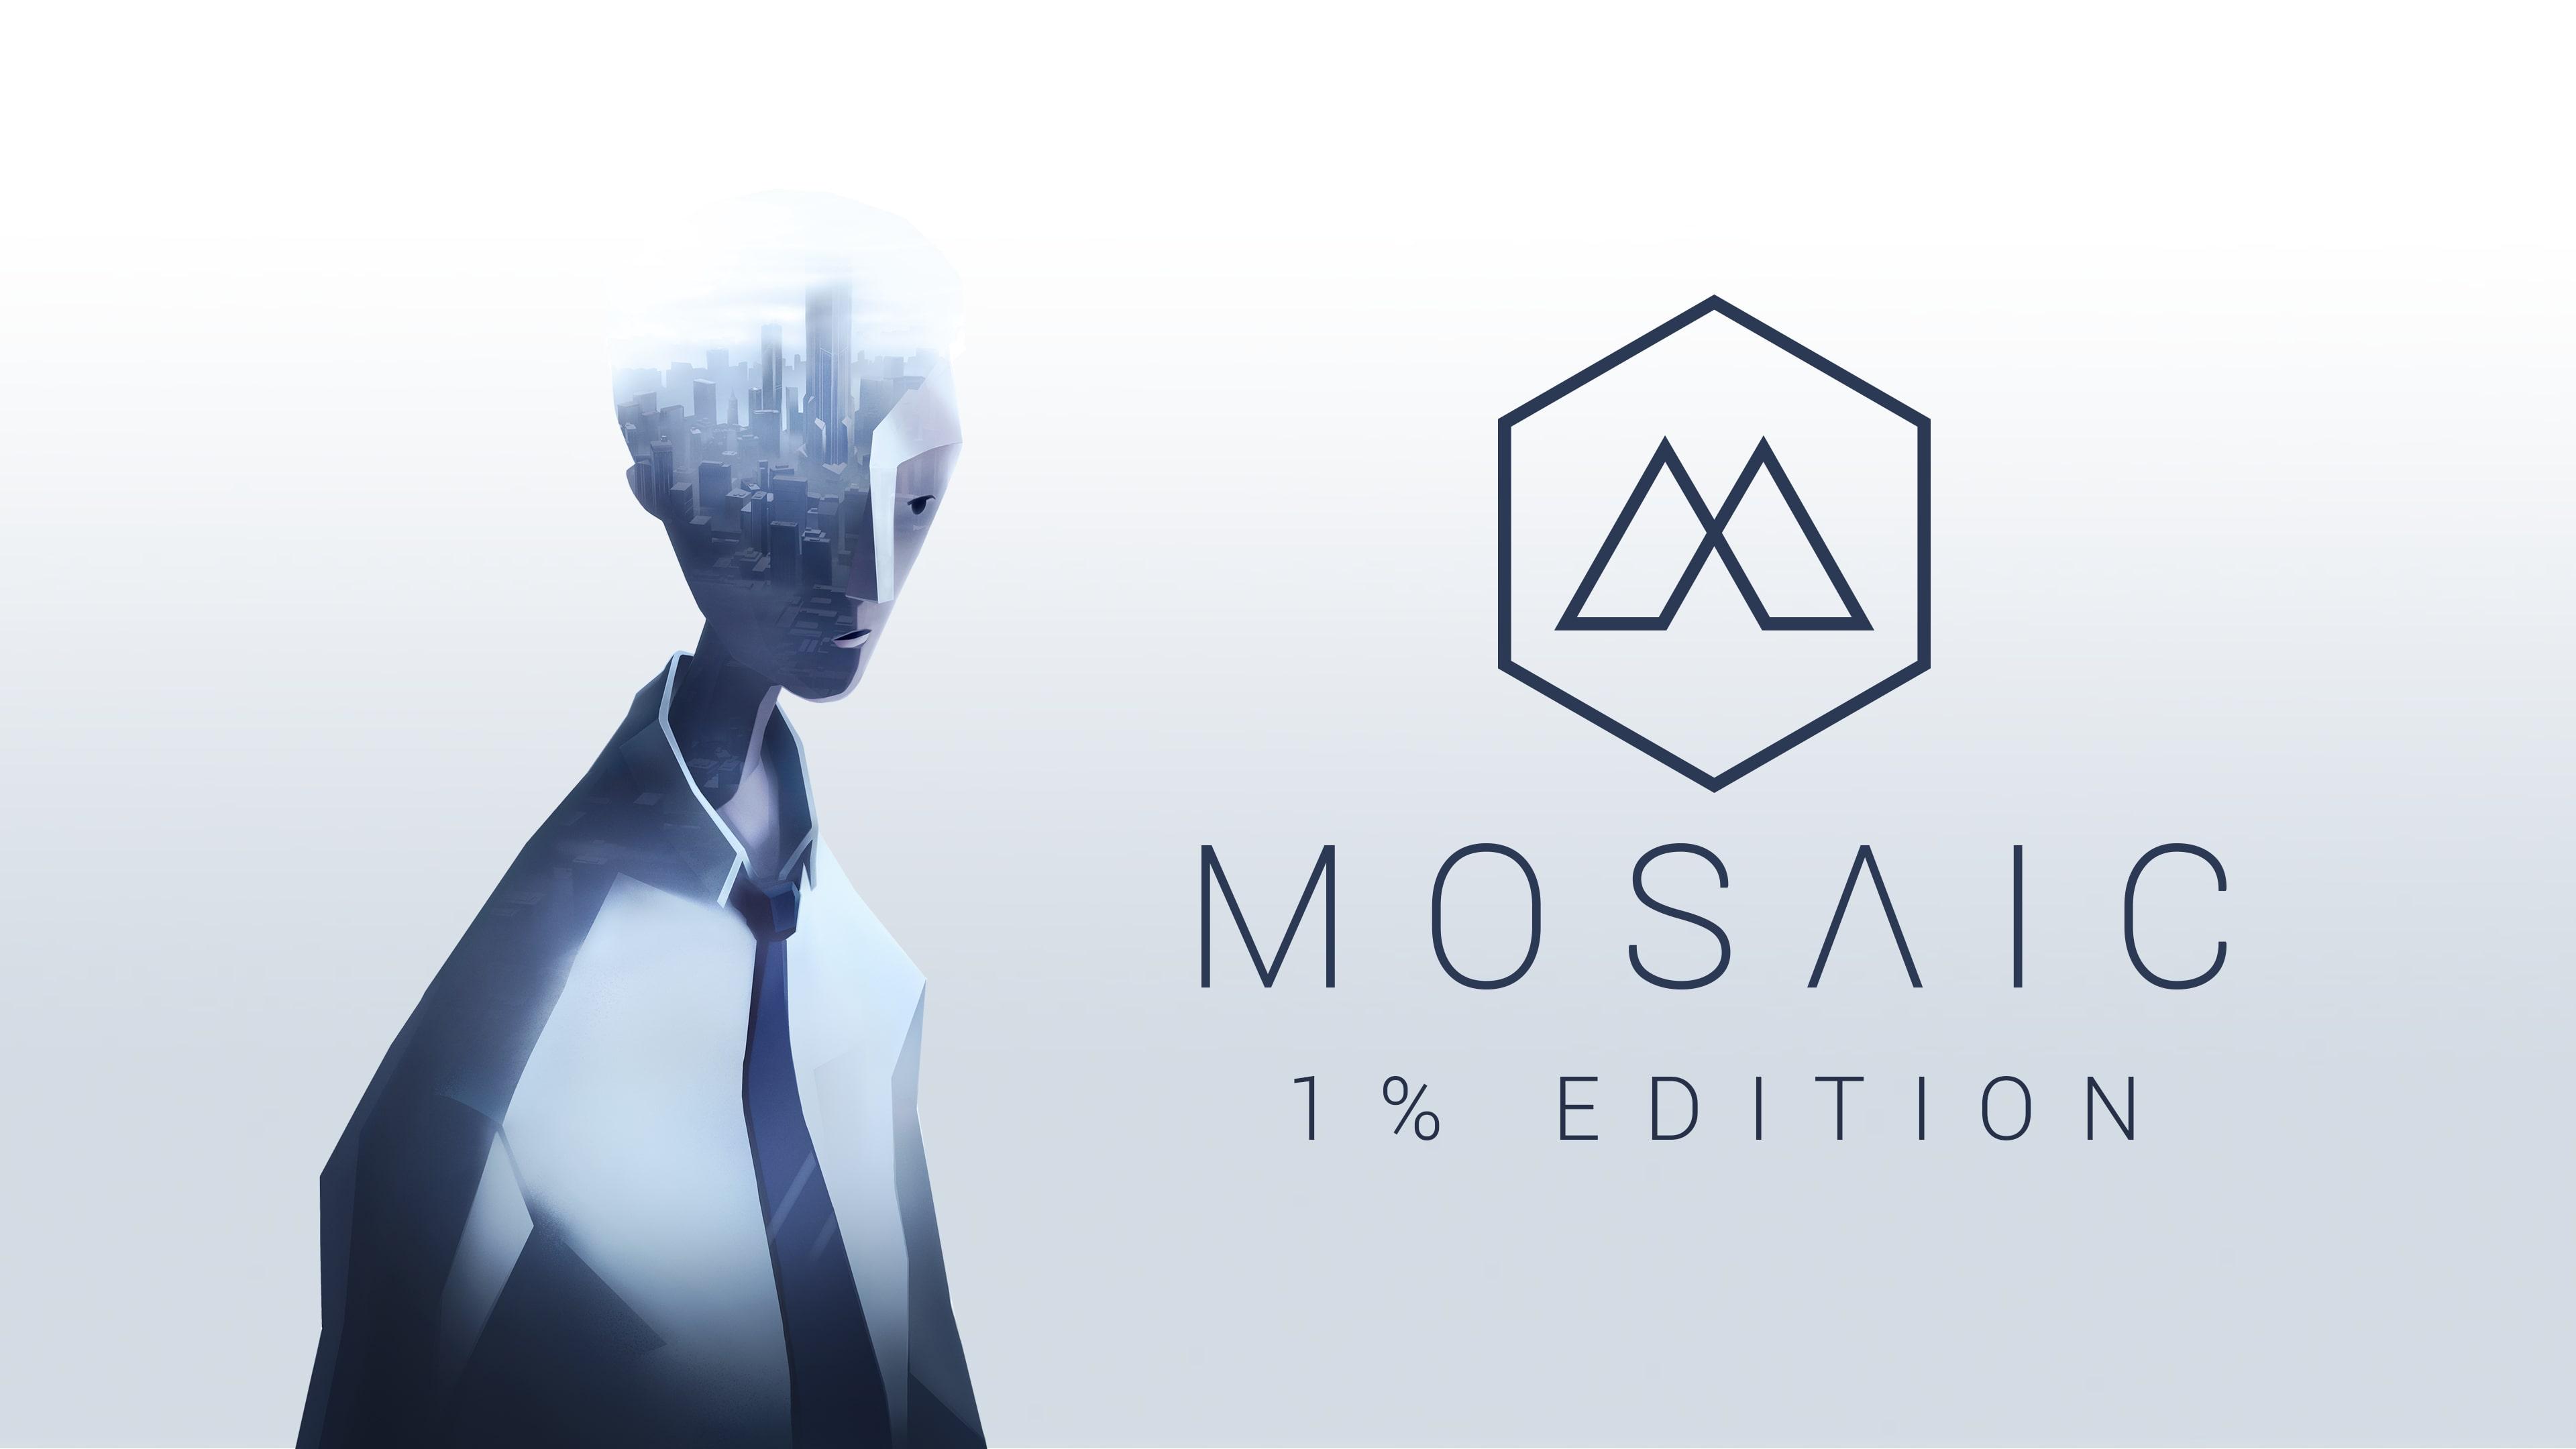 Mosaic 1% Edition